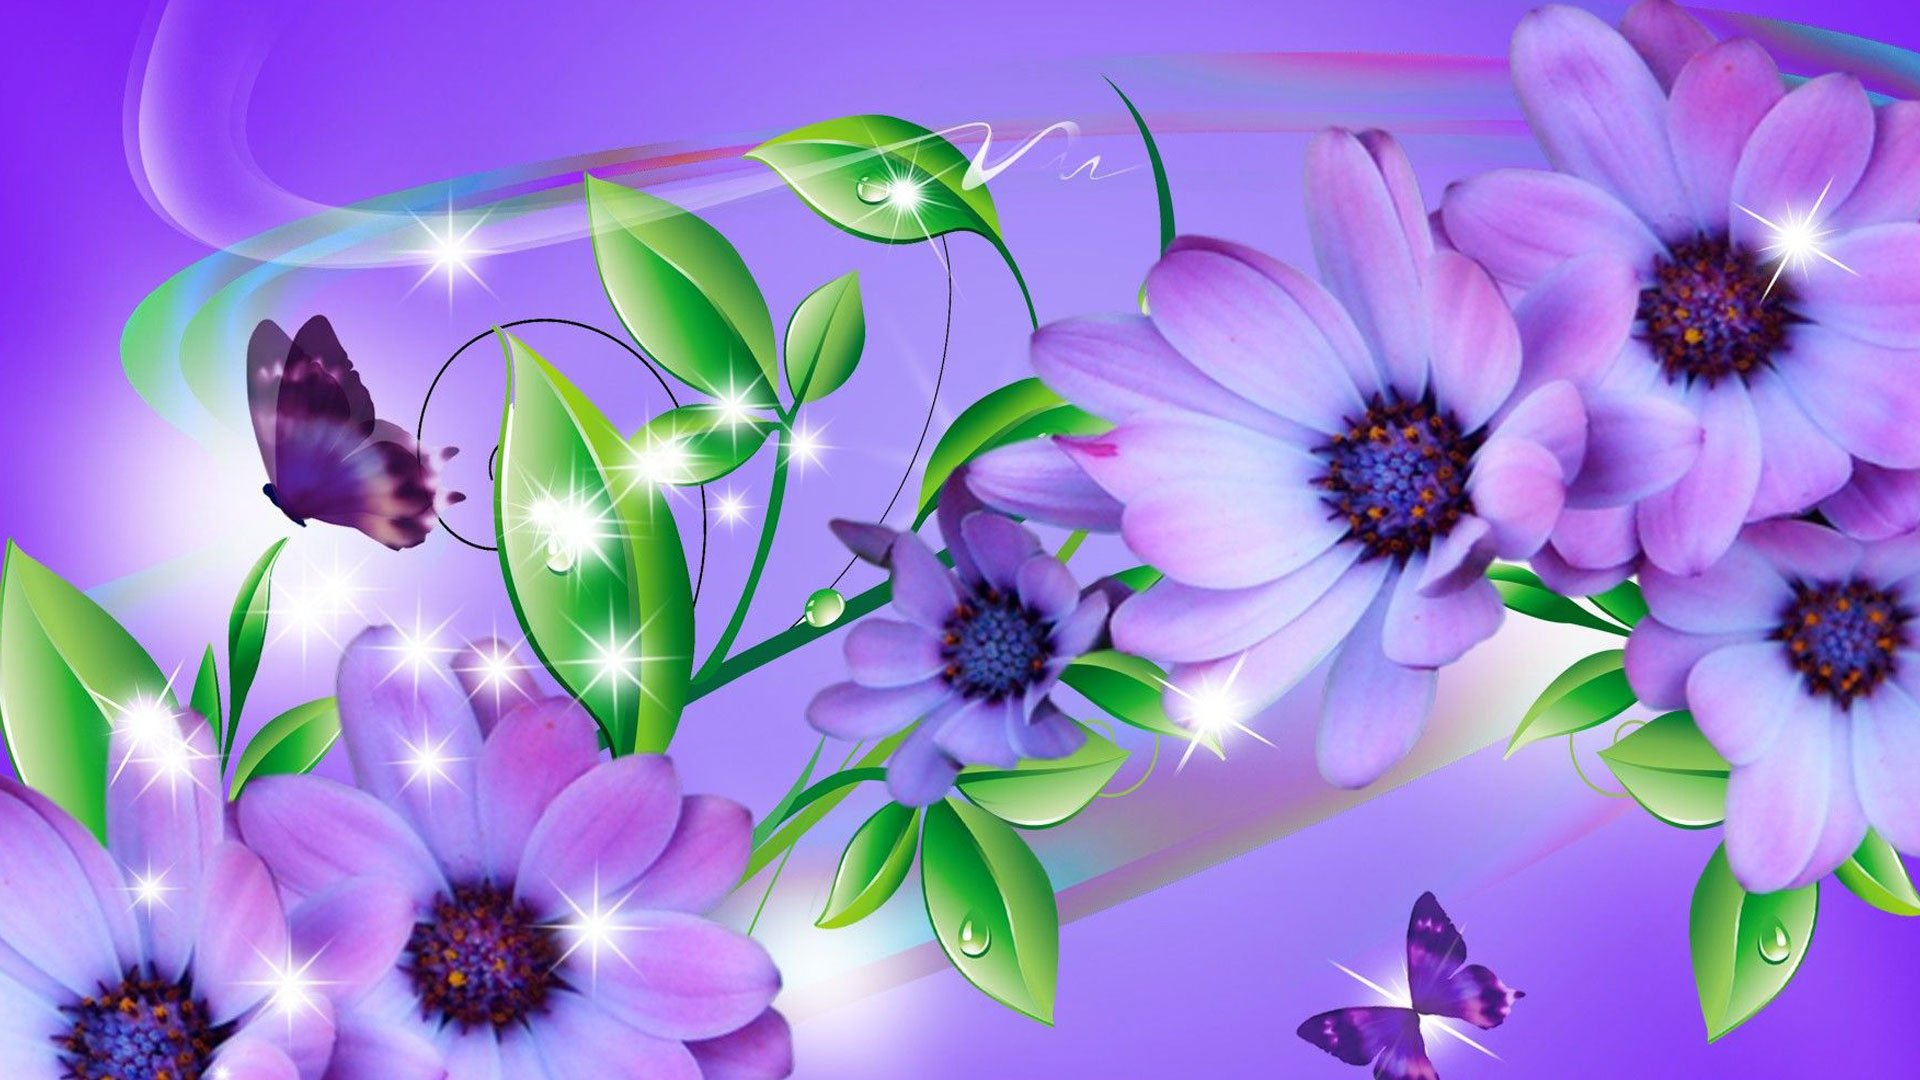 Free Download Flower Desktop Wallpaper Hi All Wallpapers